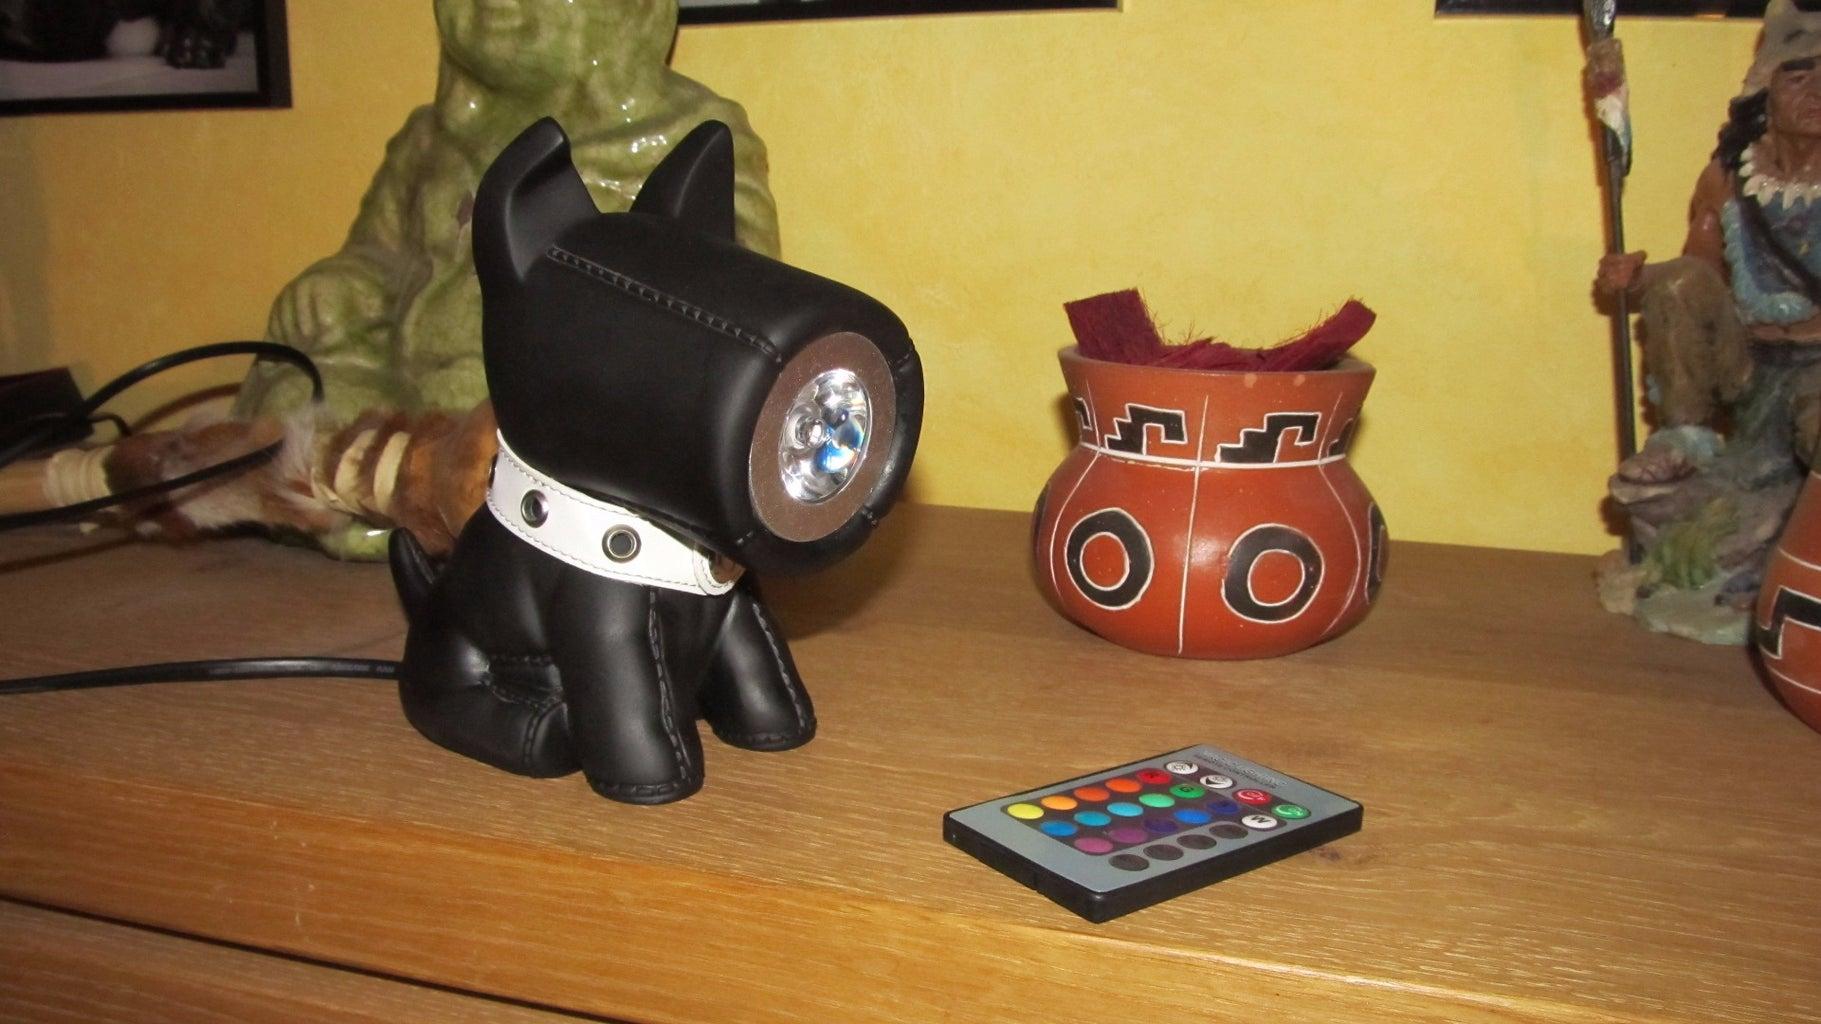 Speaker to Desktop Lamp